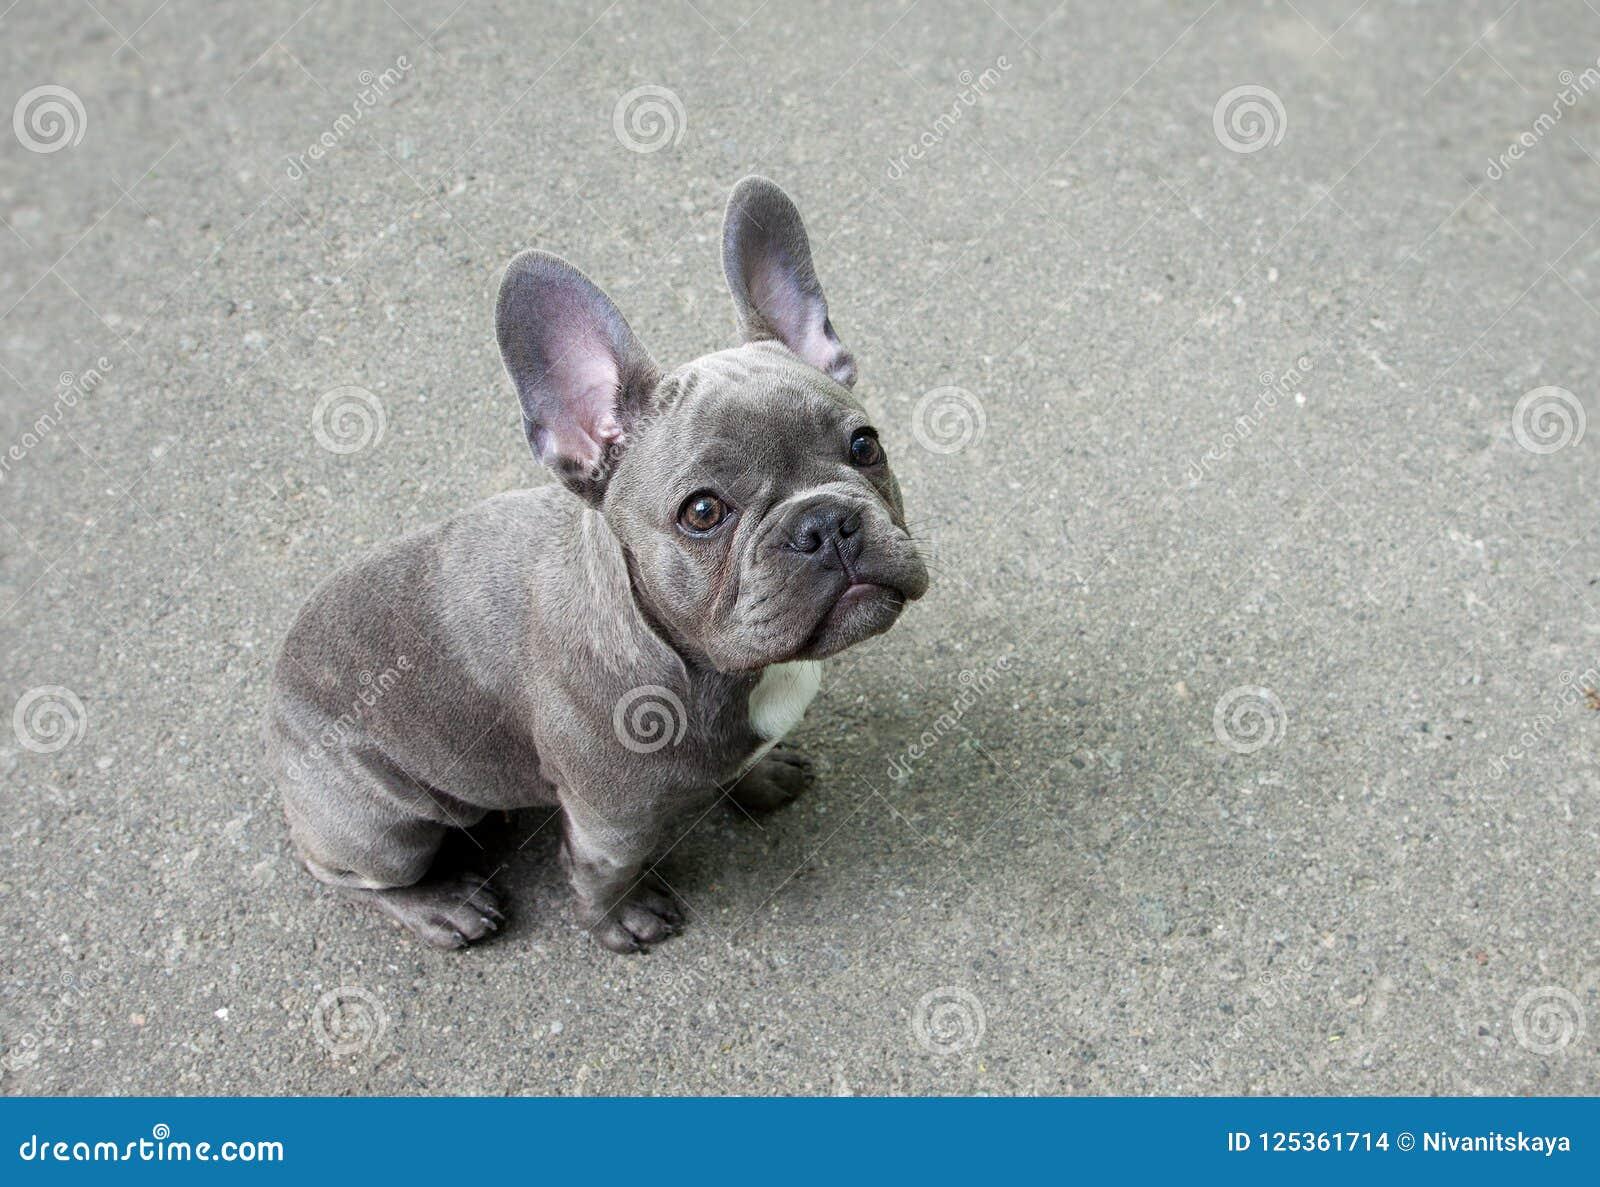 Cucciolo Grigio Di Un Bulldog Francese Su Un Fondo Grigio Piccolo